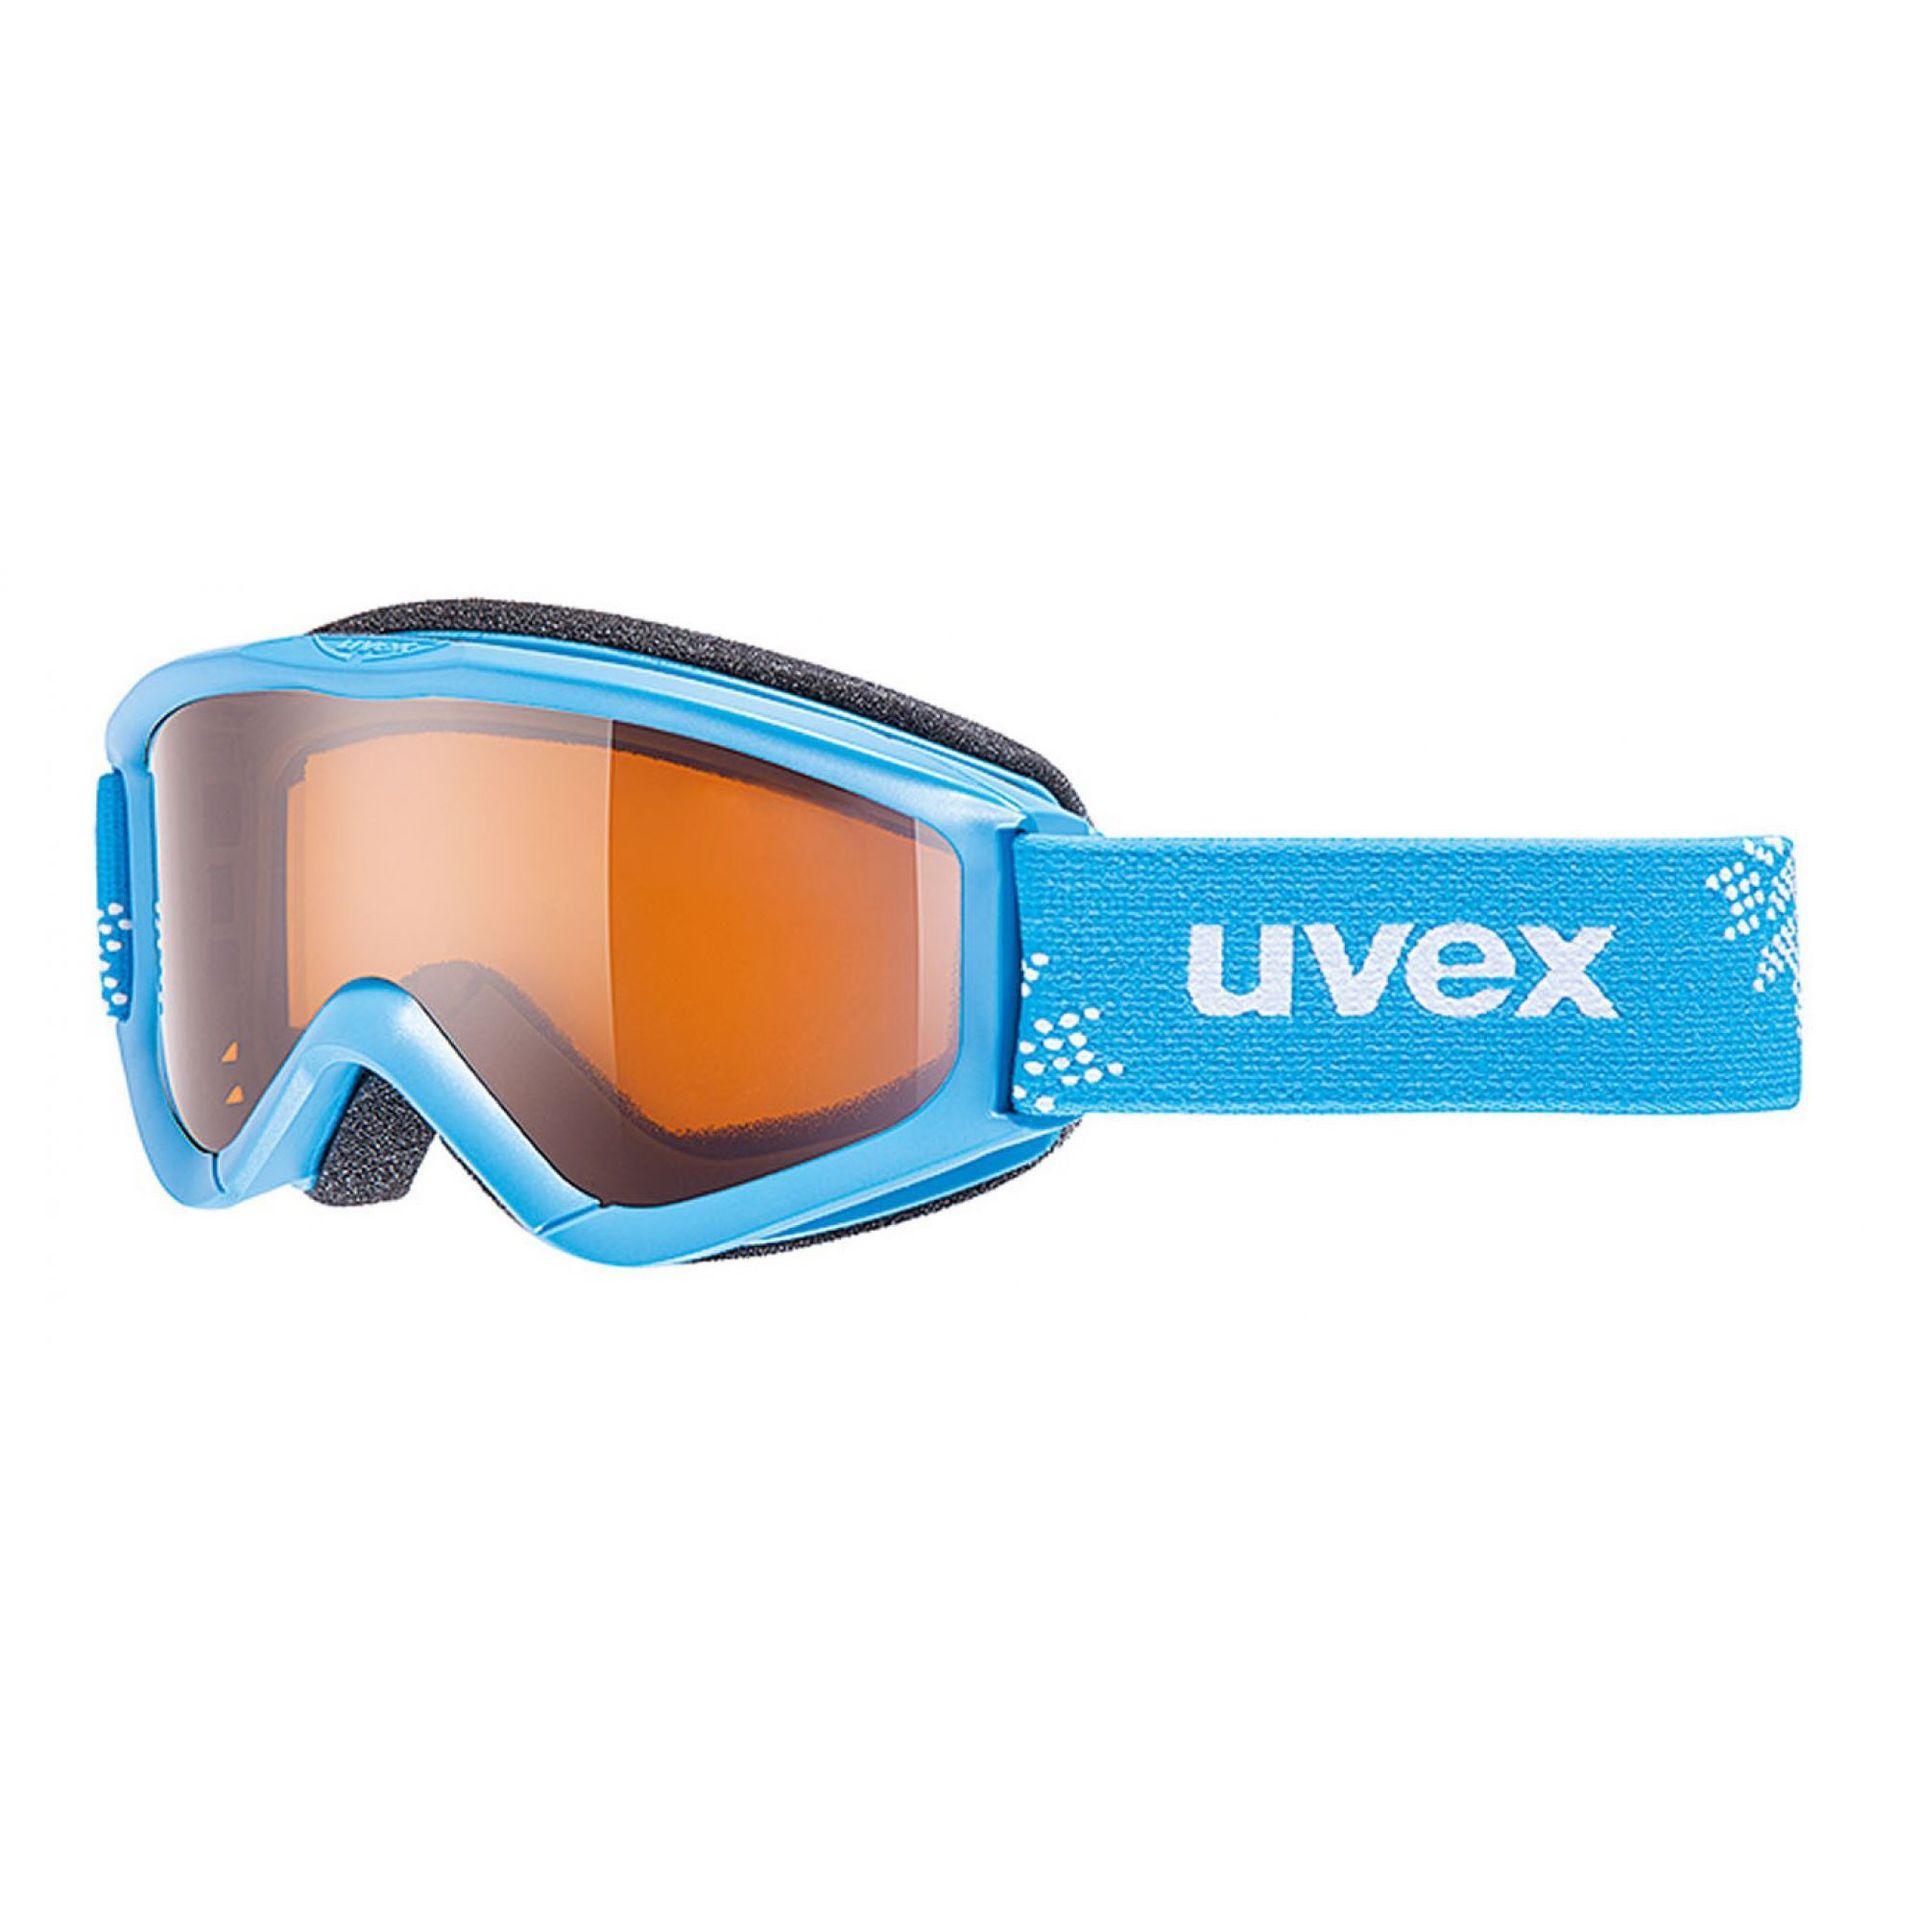 GOGLE UVEX SPEEDY PRO BLUE SNOWFLAKE|LASERGOLD S2